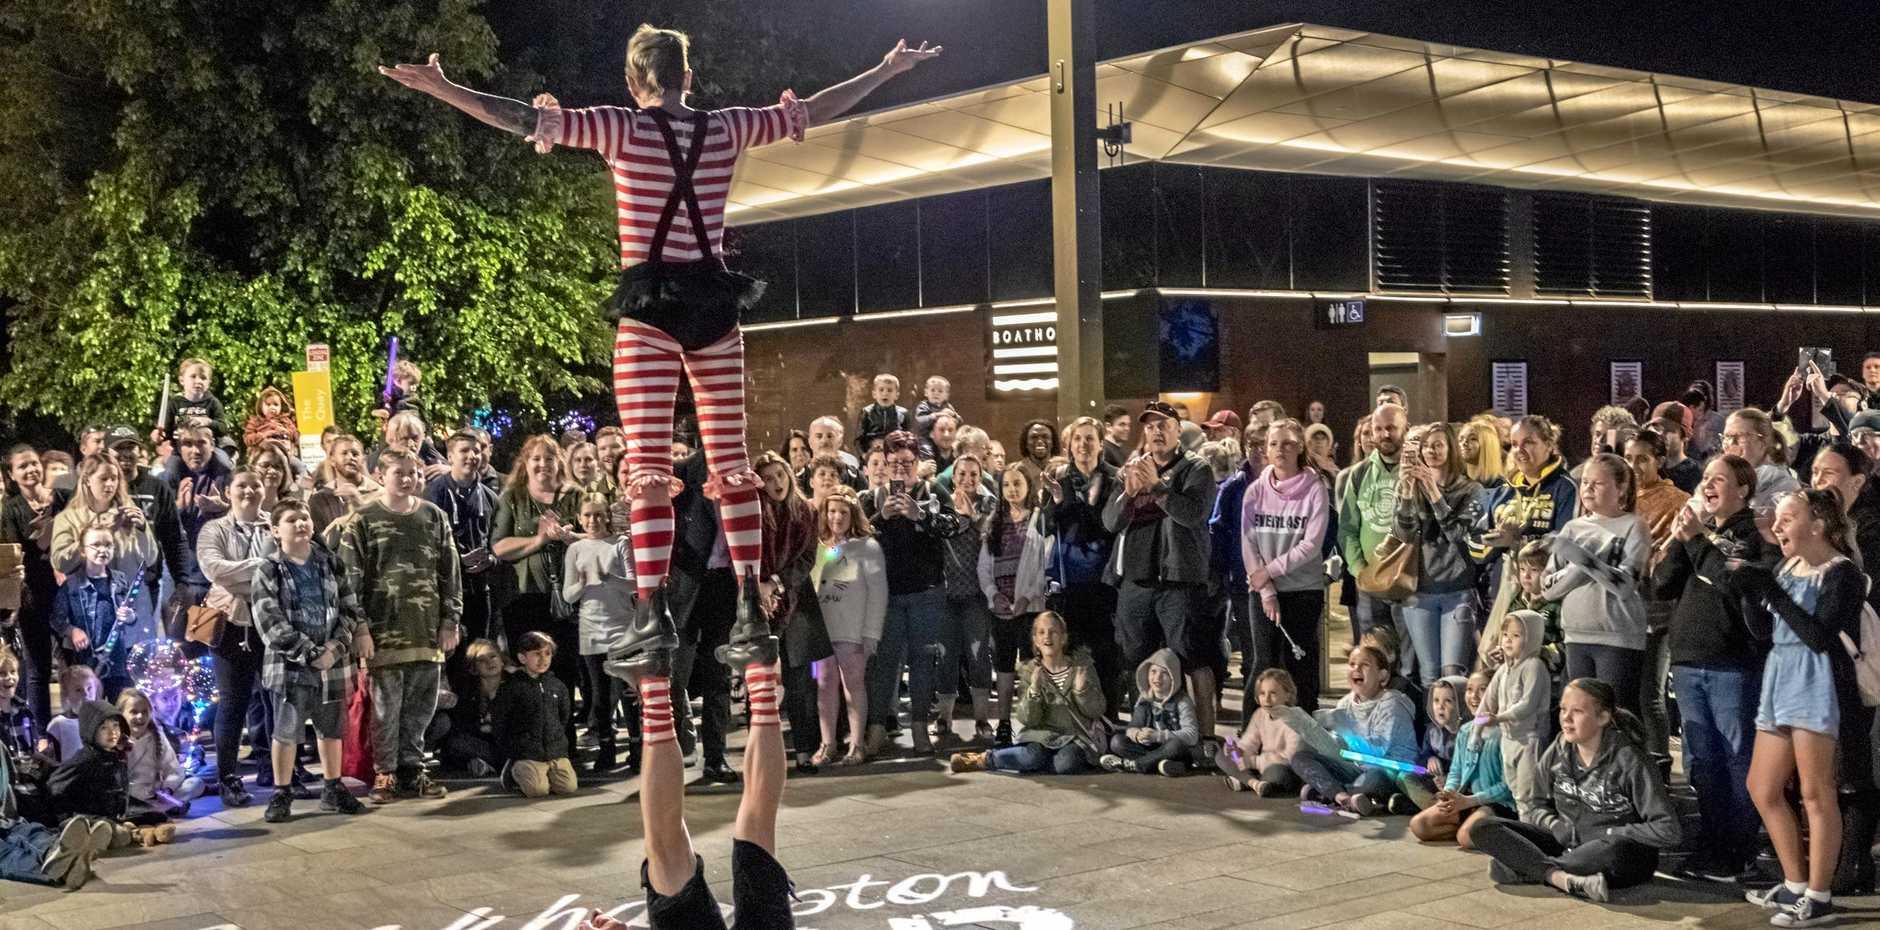 Riverfront entertainment at the Rockhampton River Festival 2018.